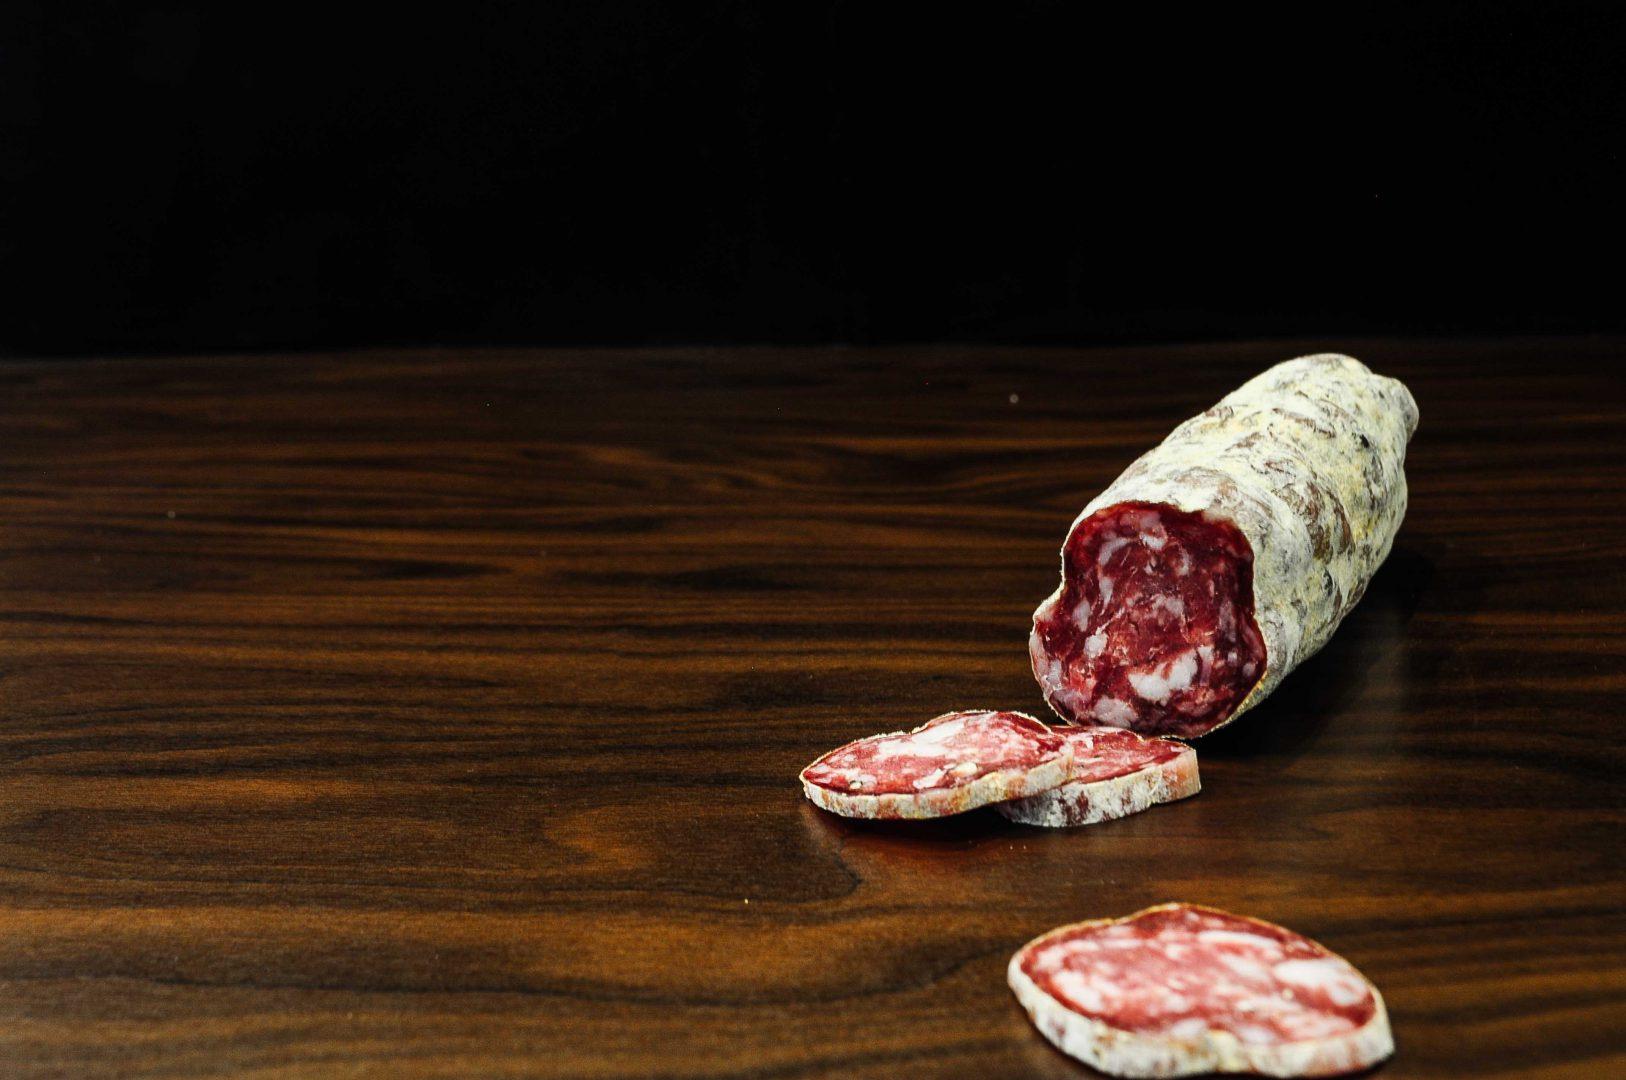 Salami,Slow Food-italienische Feinkost